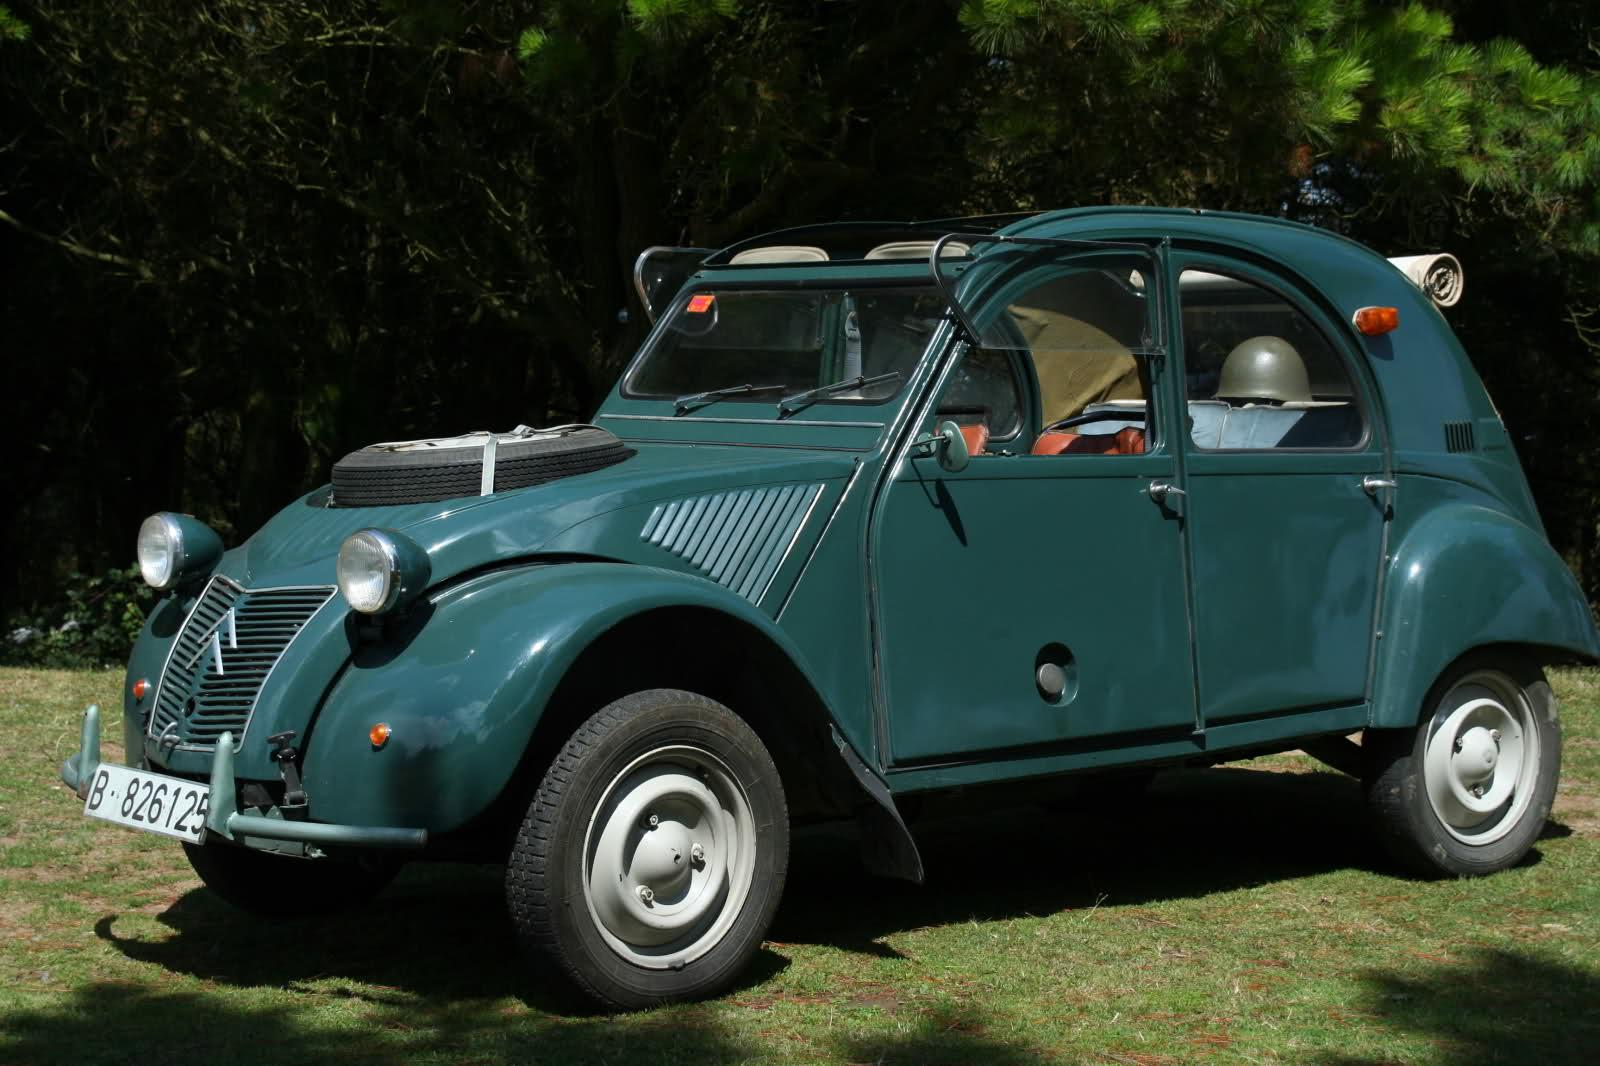 venta coche 4x4 entre particular: